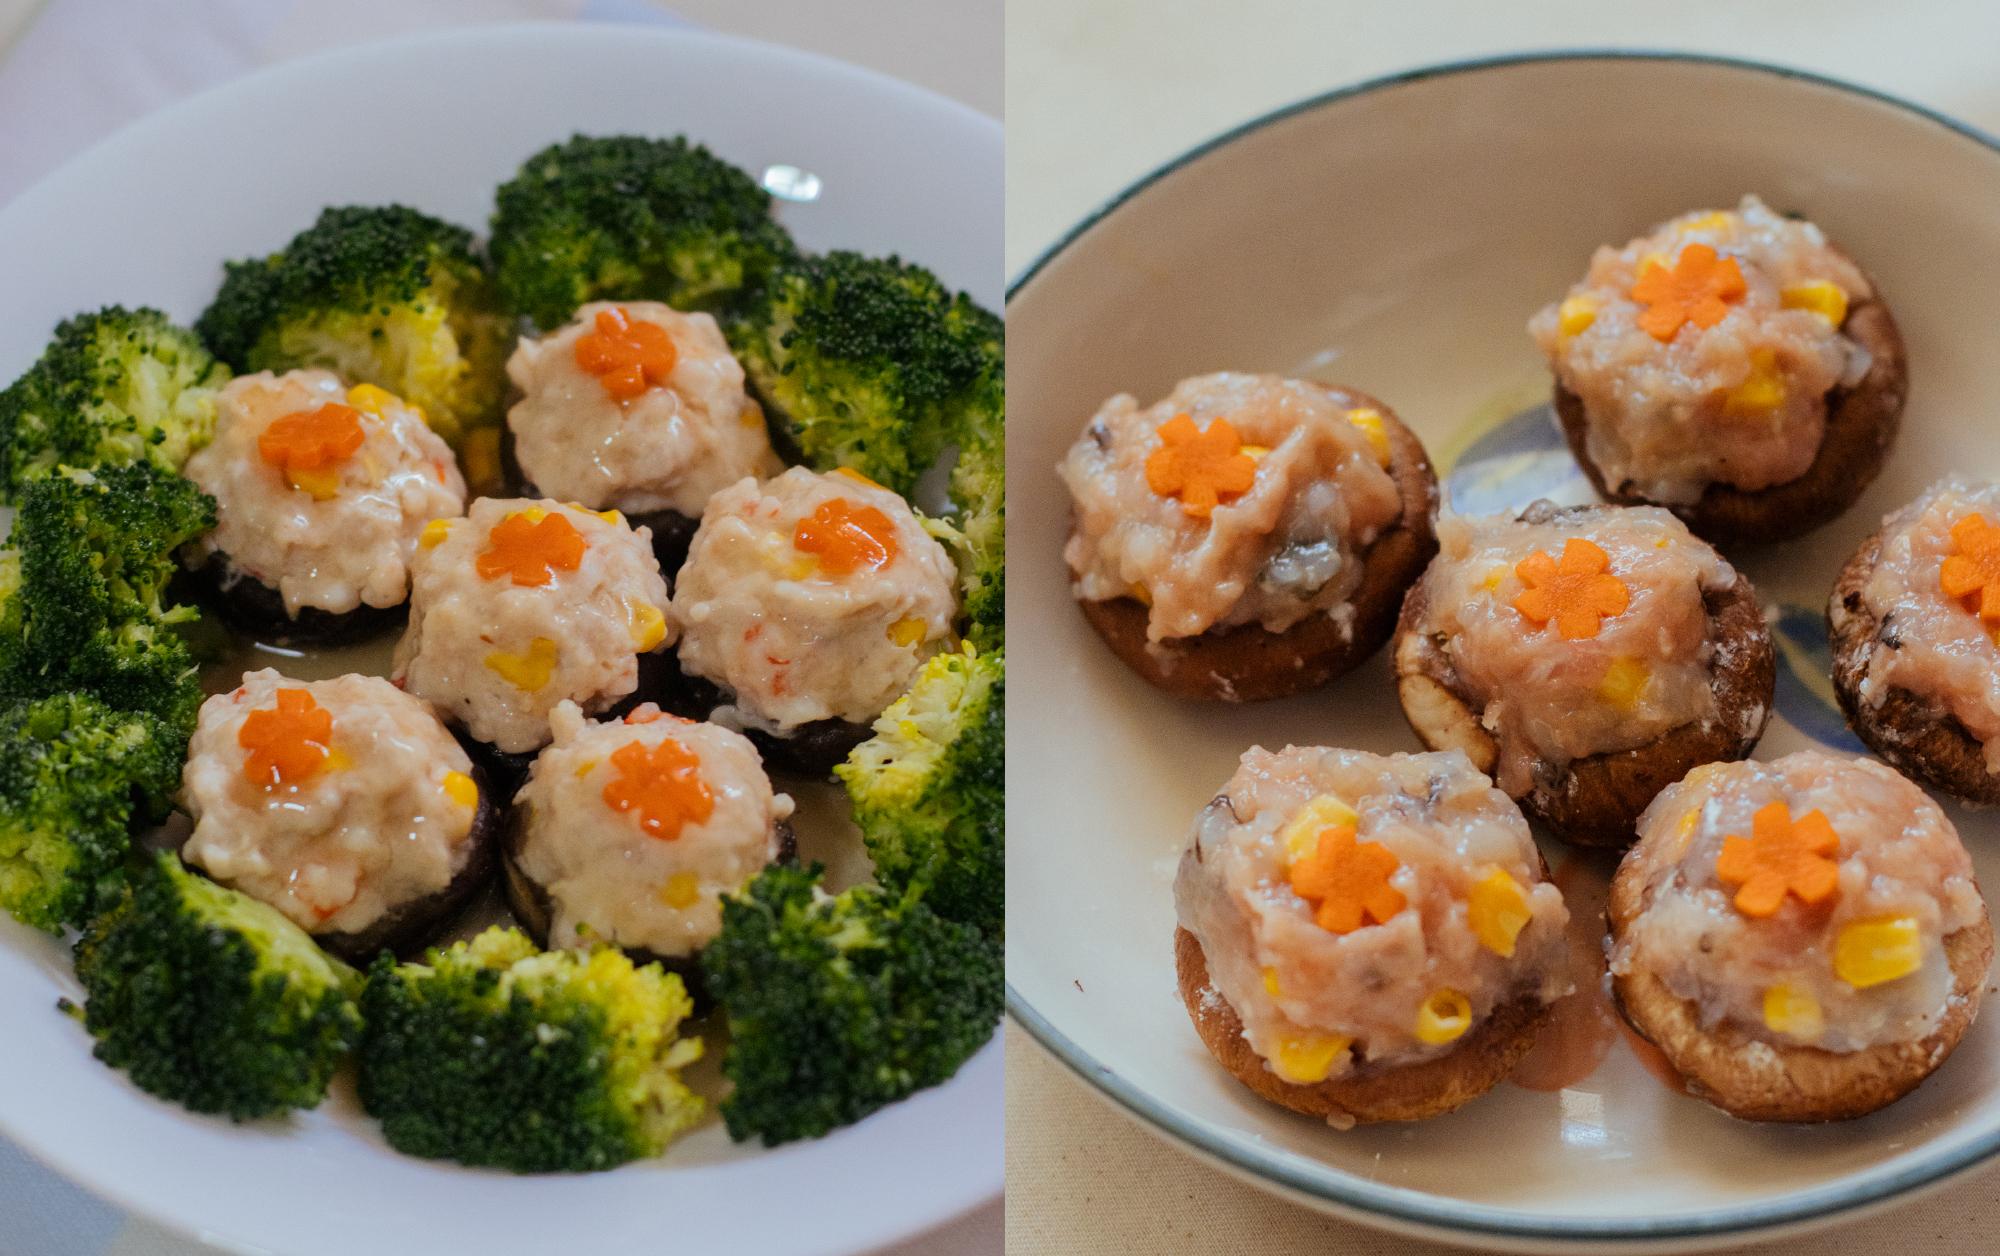 Cooking With Mums Of DC Edit: Yokey's Minced Pork & Prawns Stuffed Mushroom Recipe